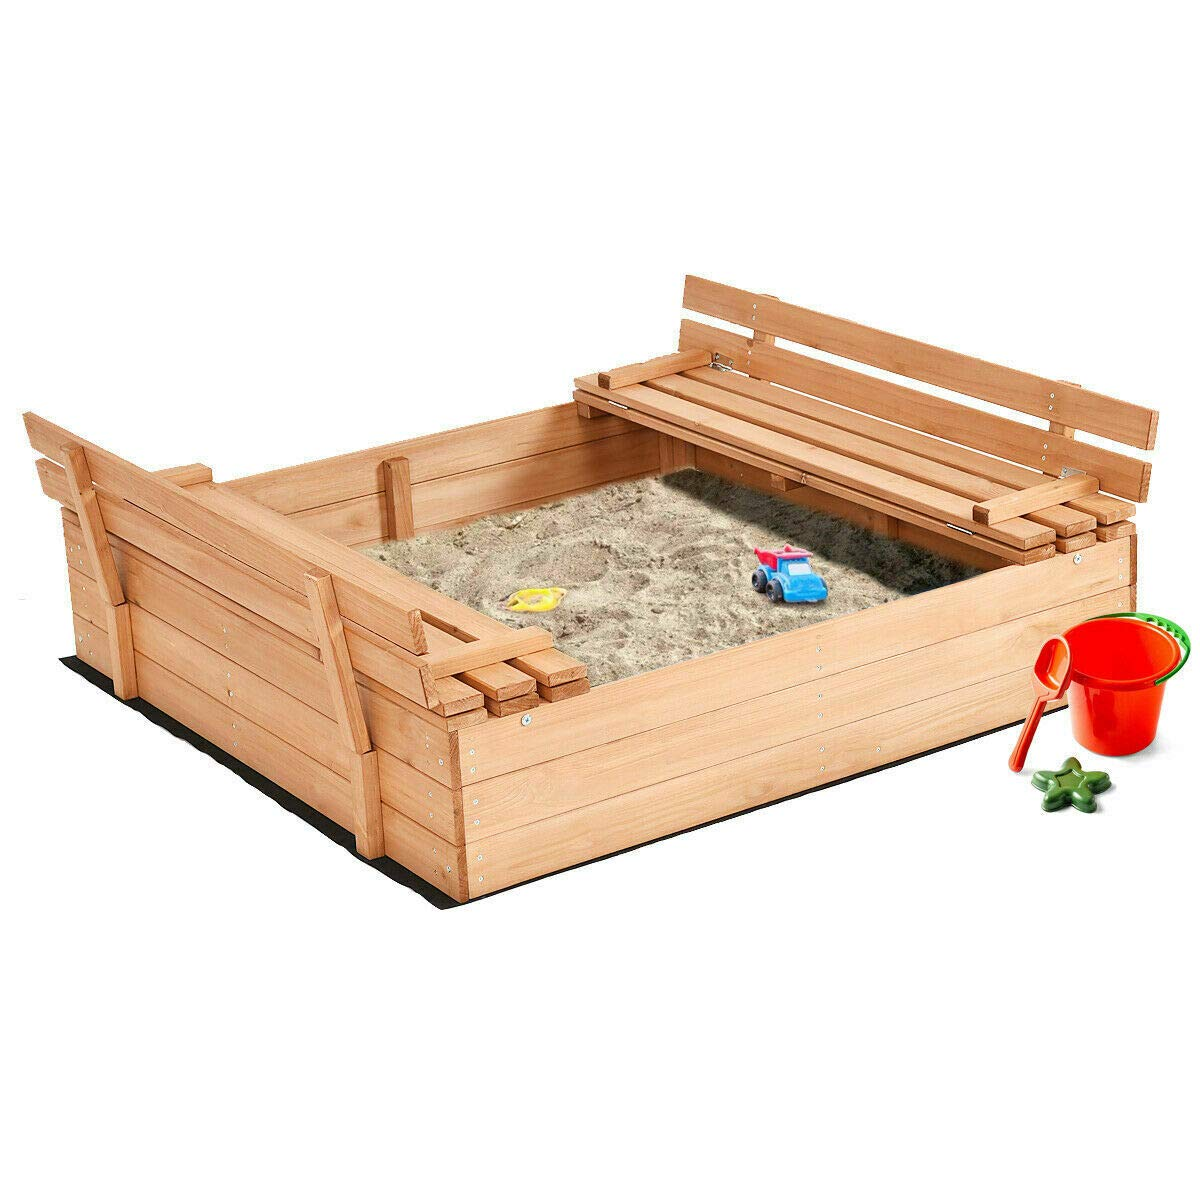 allgoodsdelight365 Foldable Beach Cabana Sandbox Retractable w/ Bench Seat Kids Children Outdoor by allgoodsdelight365 (Image #1)